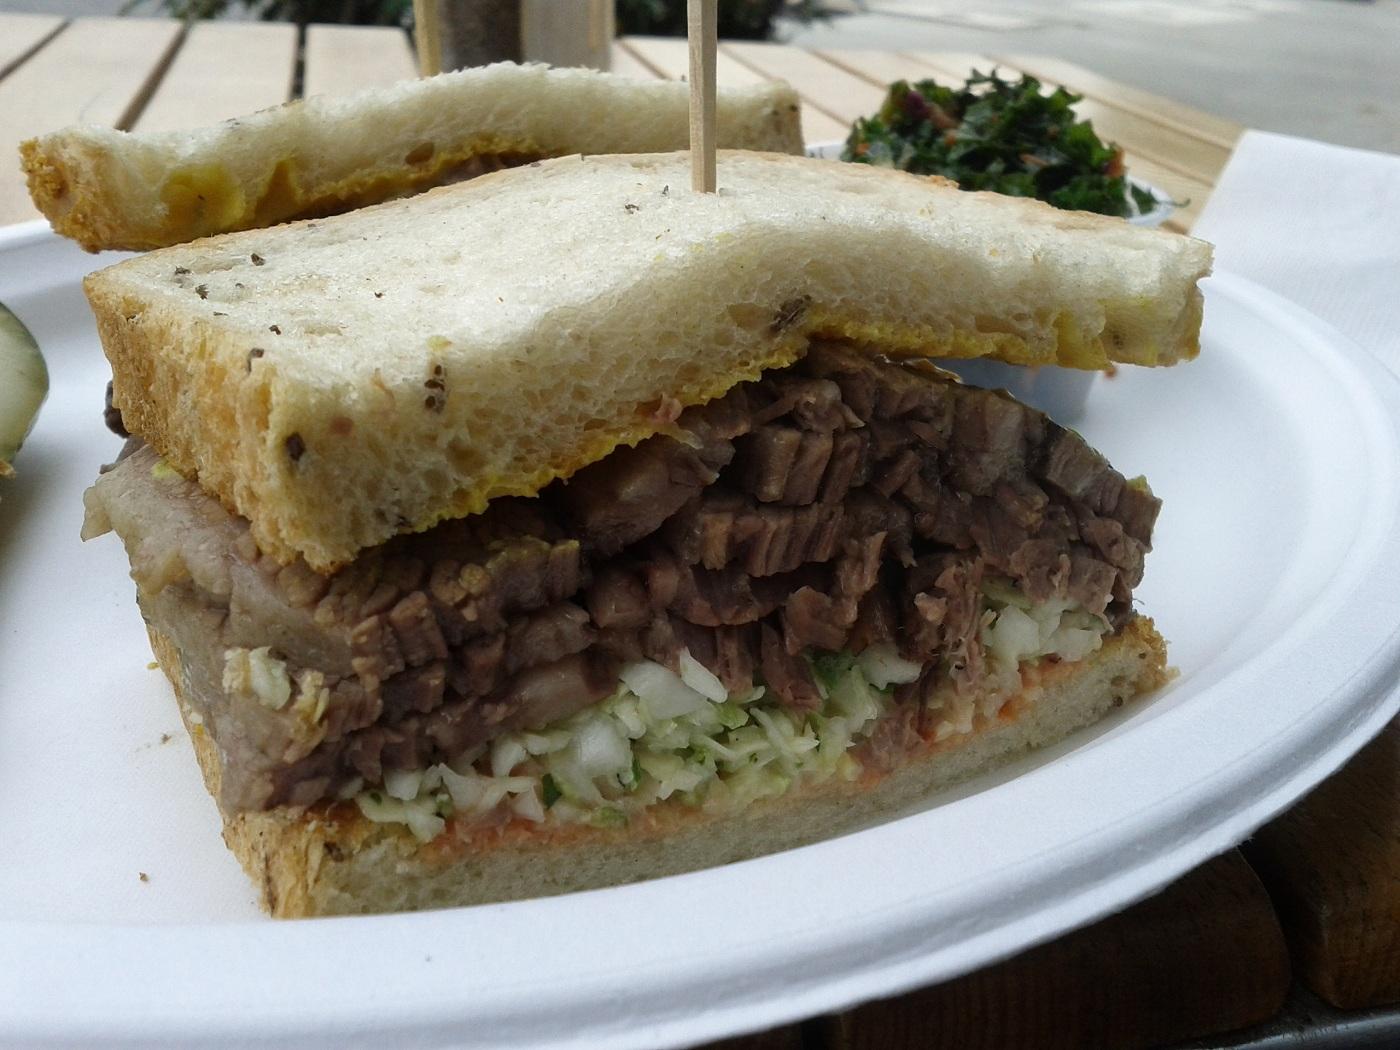 ... Roast Deli & Market, Brentwood Village, Los Angeles | On Sandwiches